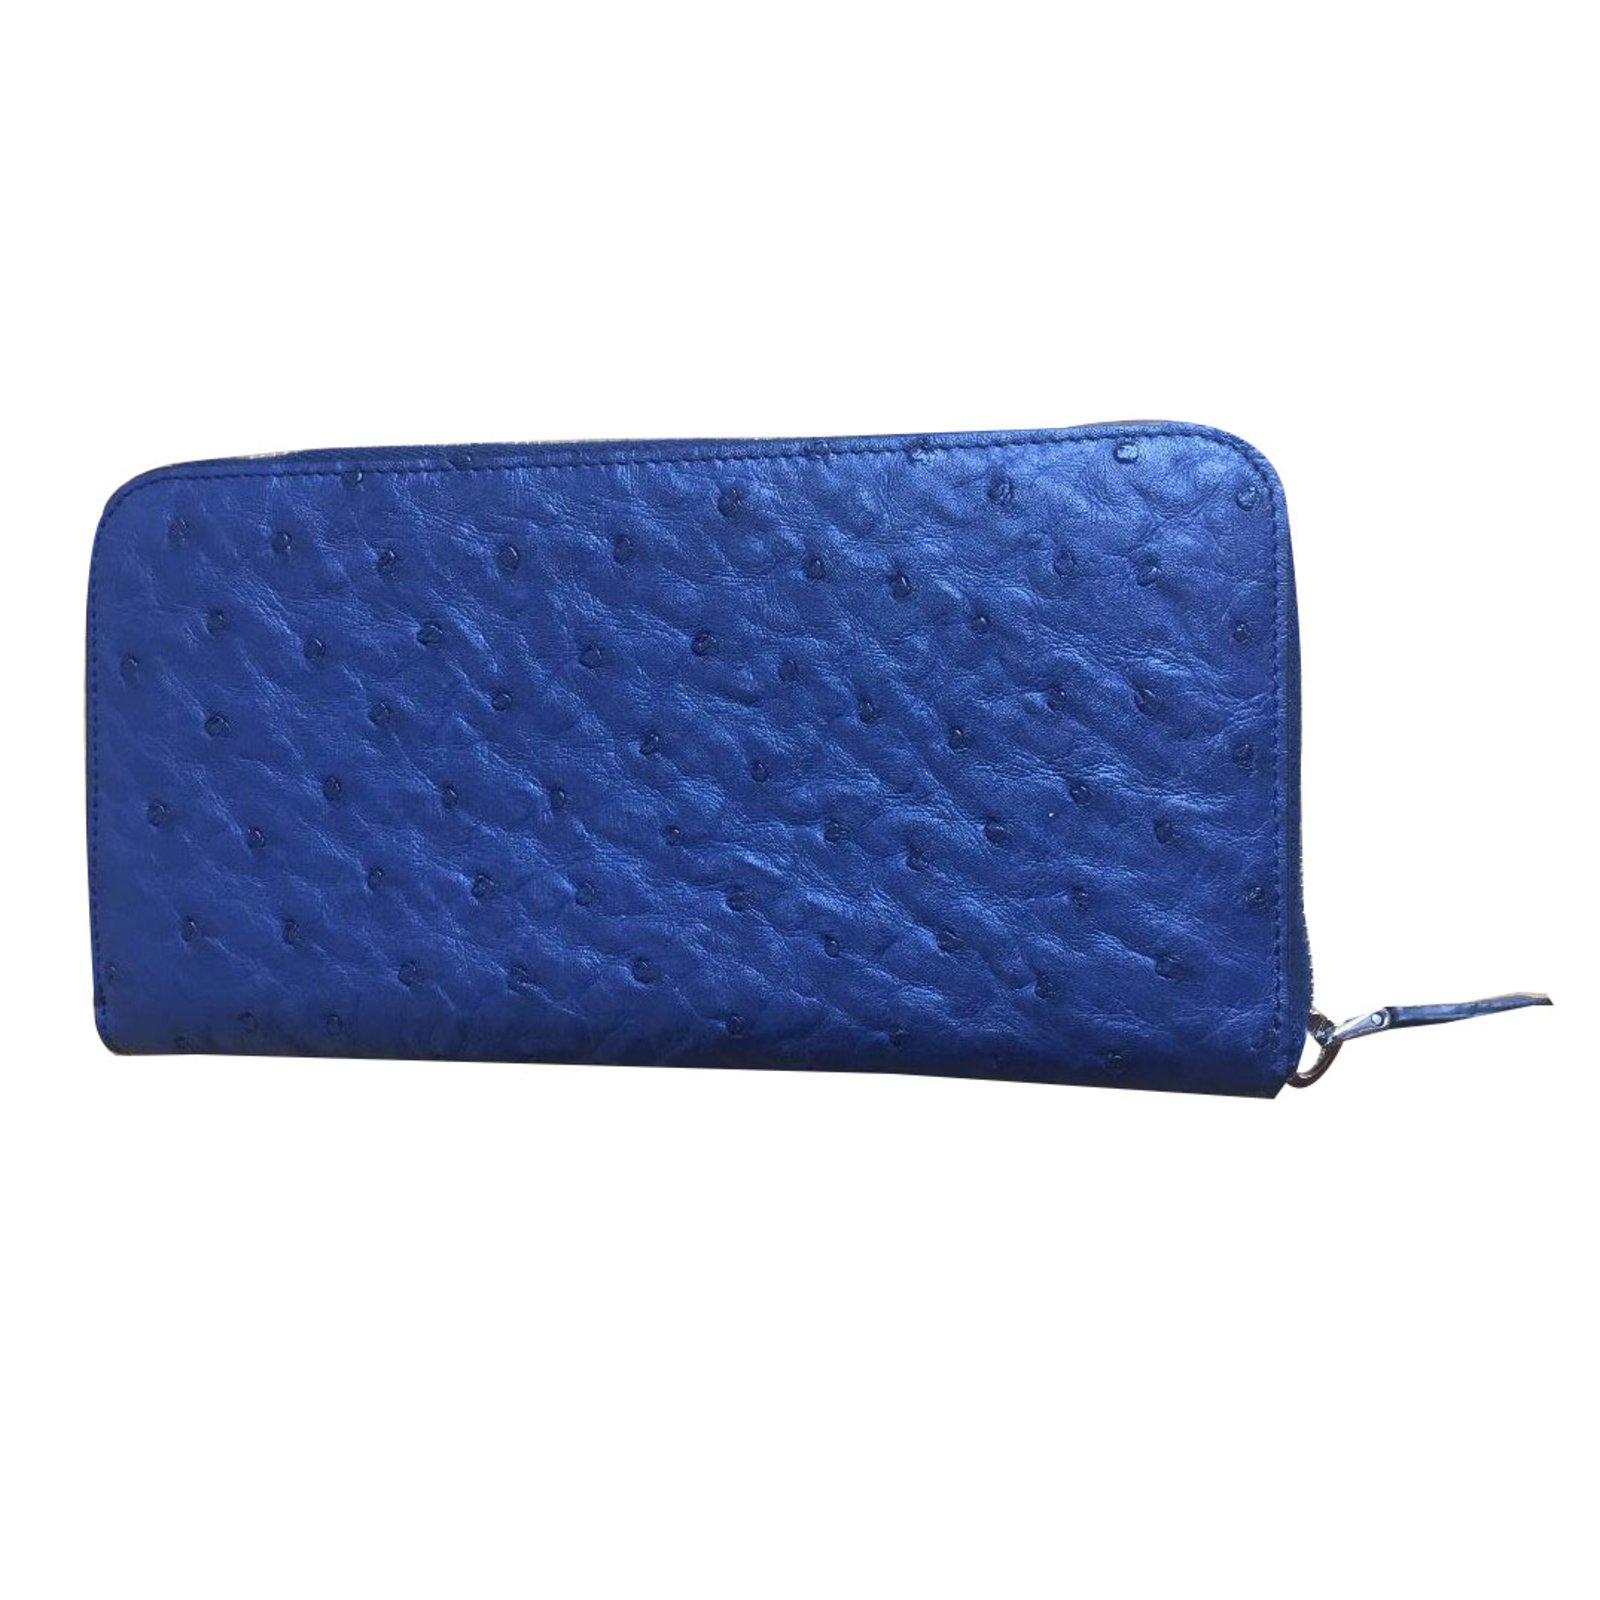 7262c8091707 shop prada prada saffiano leather bifold wallet c5fc6 295c4  czech prada  prada new ostrich wallet wallets exotic leather blue ref.77667 2ba2d cb0a3